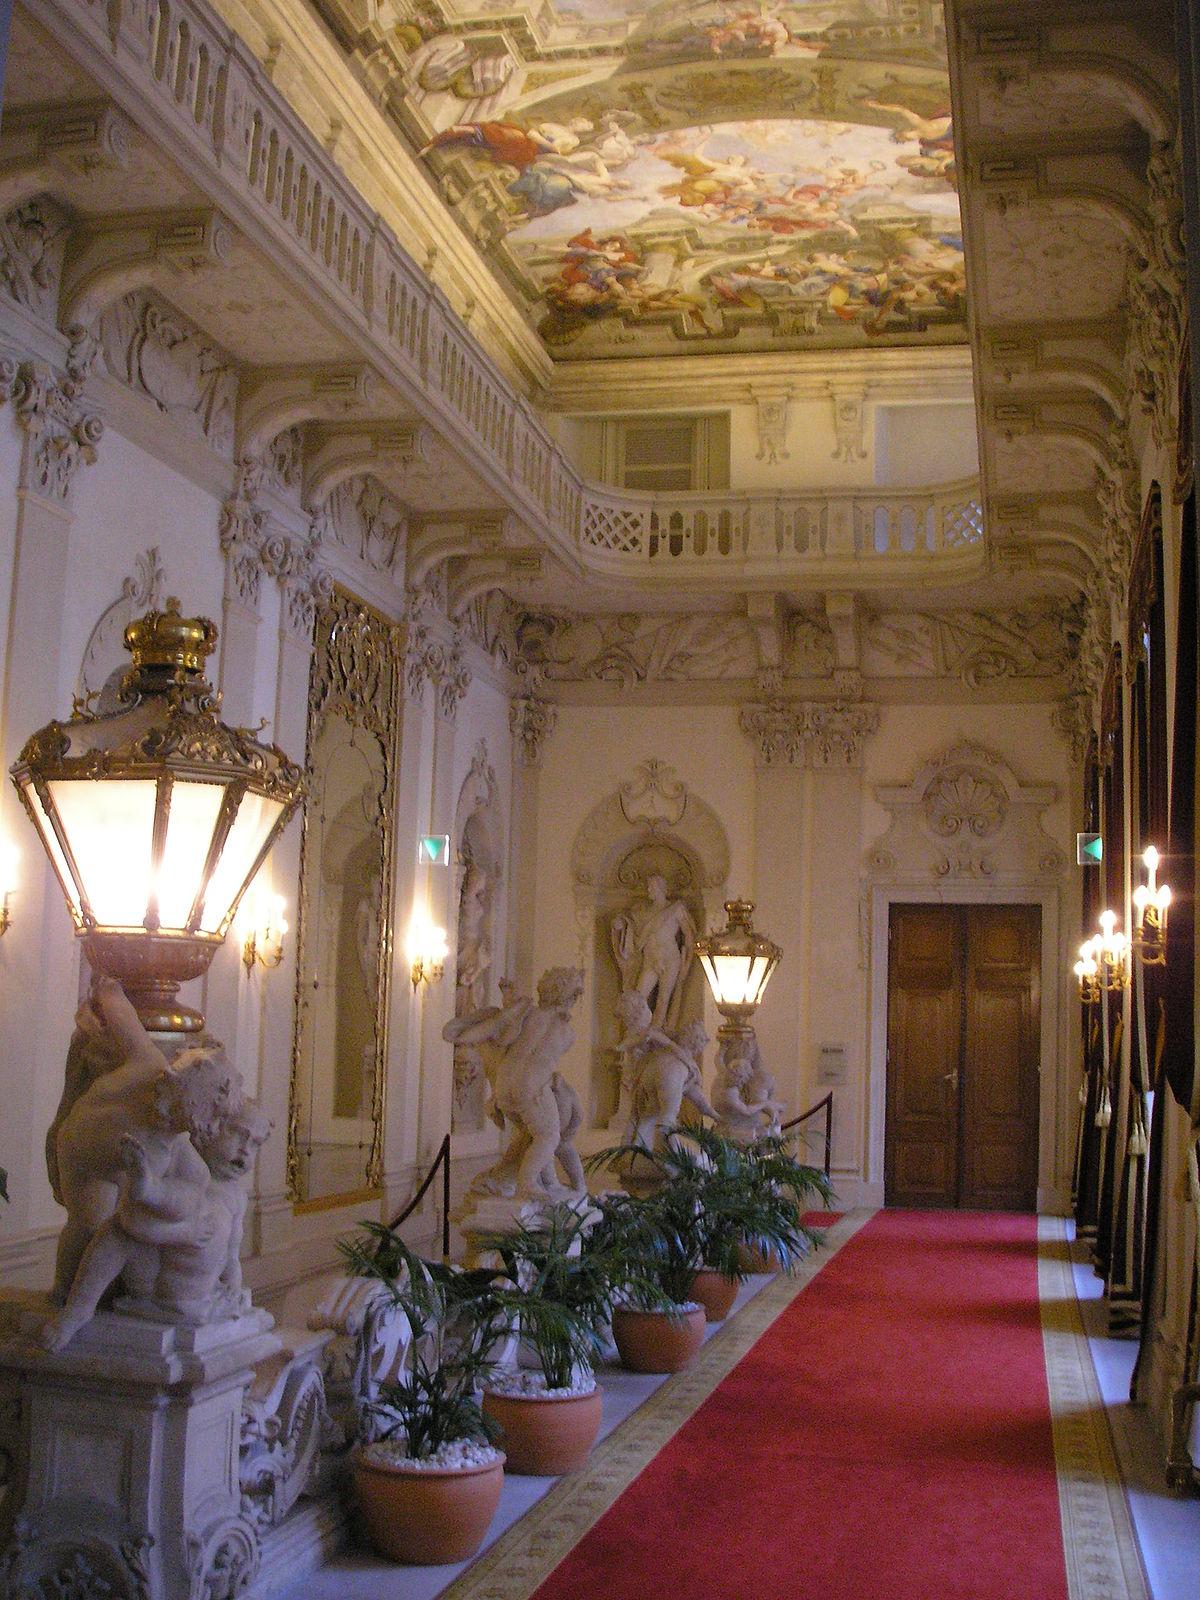 Fichier:Palais Kinsky Vienna June 2006 079.jpg — Wikipédia